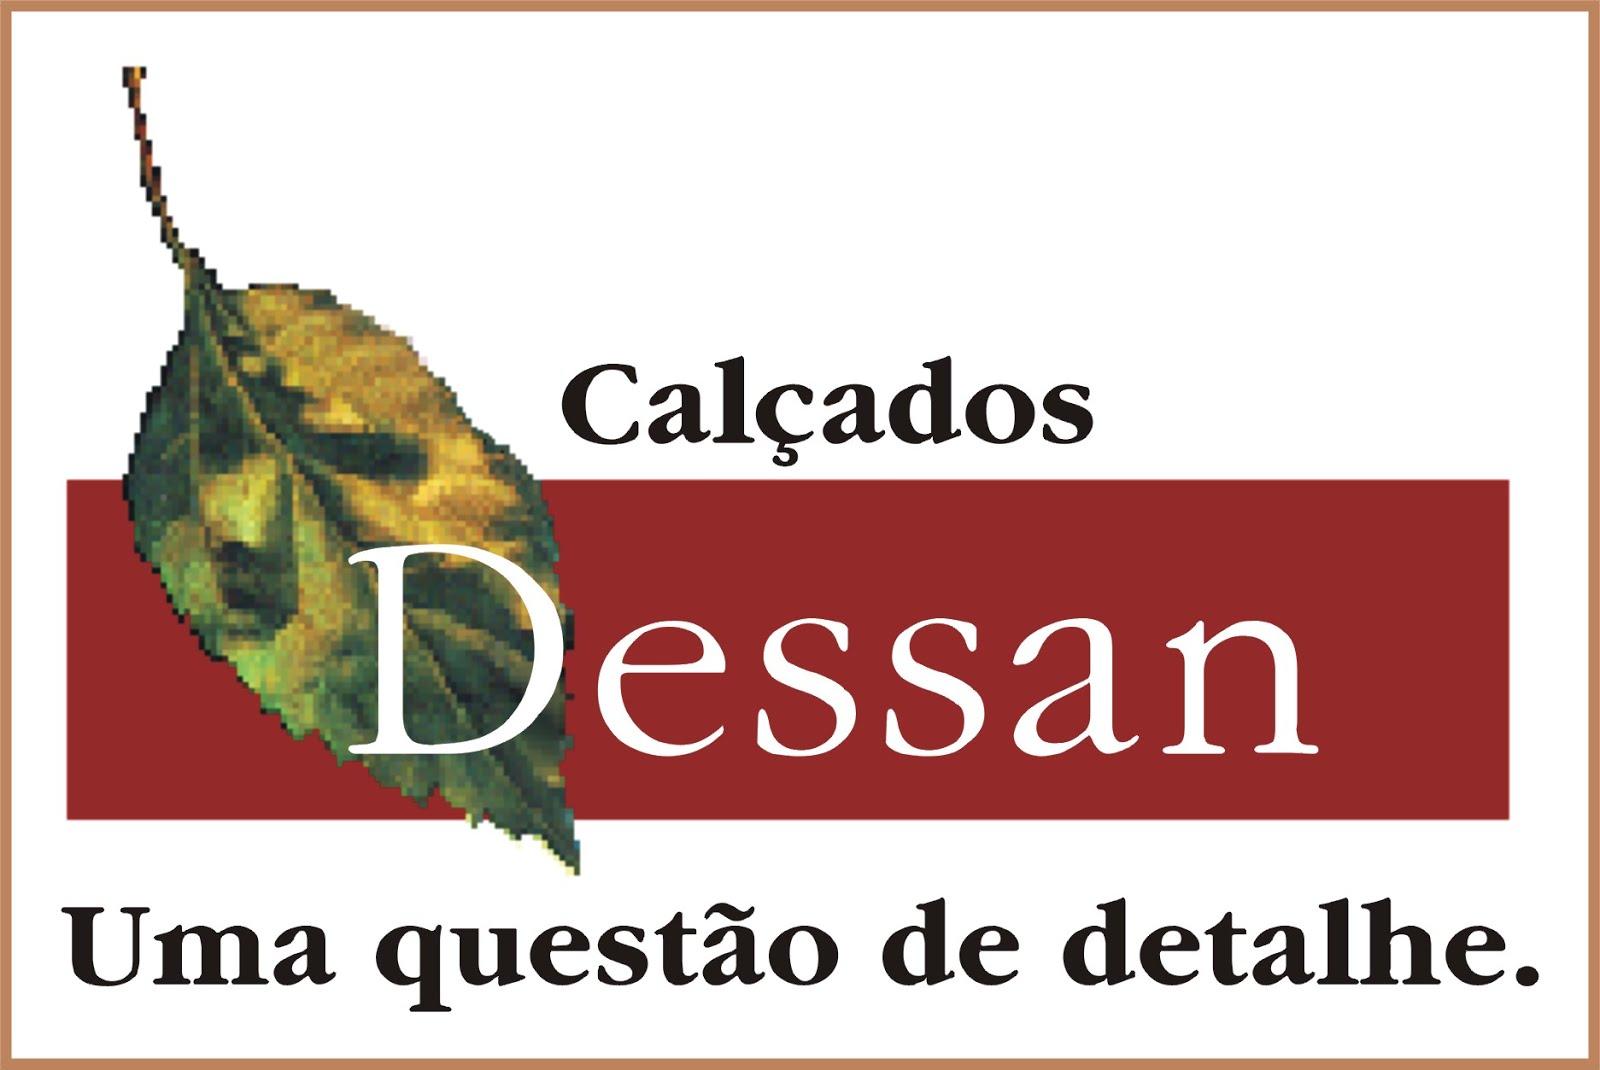 Calçados Dessan Ltda.